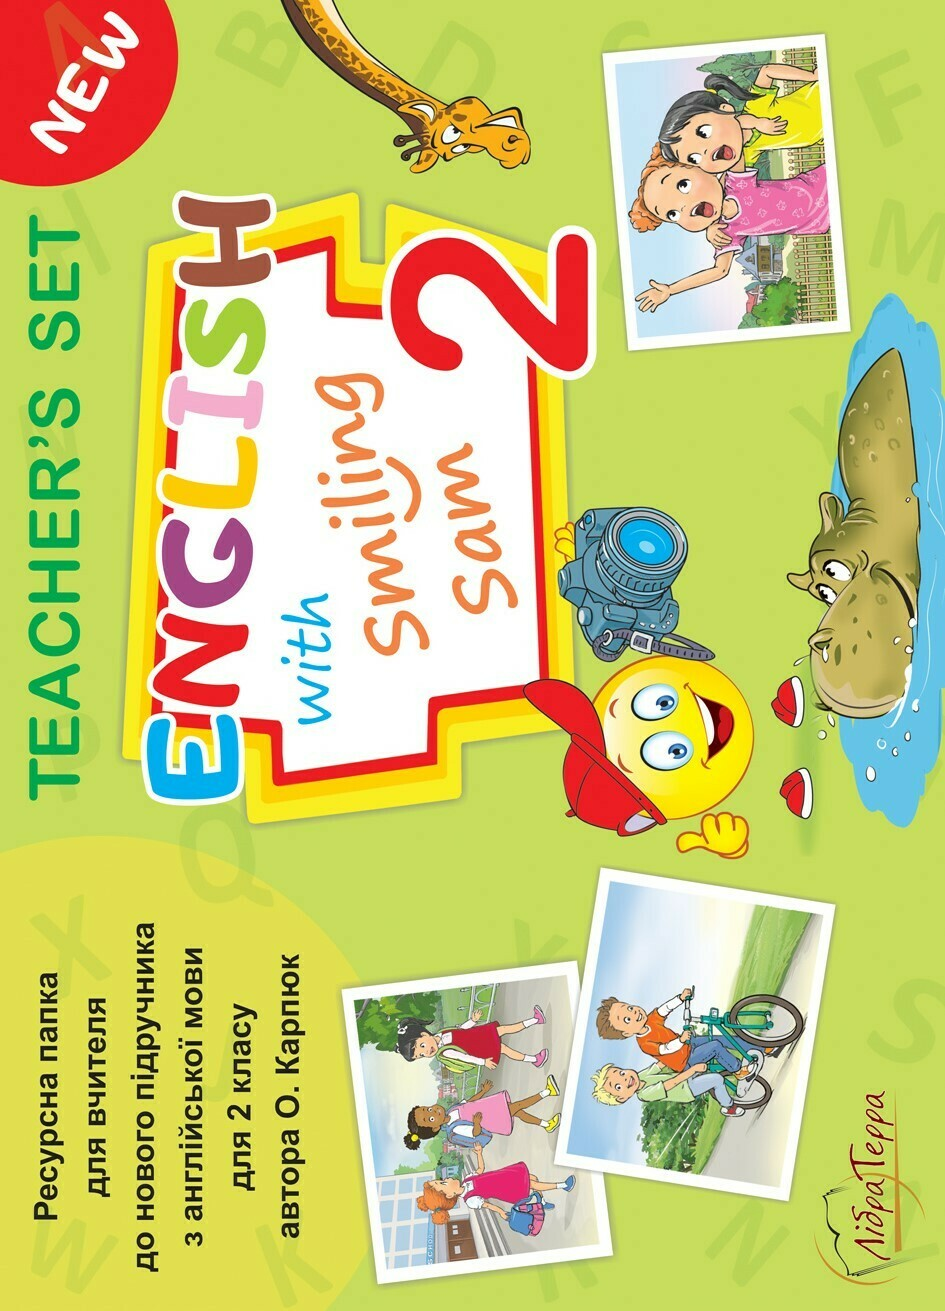 2 клас НУШ Карпюк О.Д. Ресурсна папка для вчителя до НМК English with Smiling Sam 2 Лібра-Терра (4821000215487)